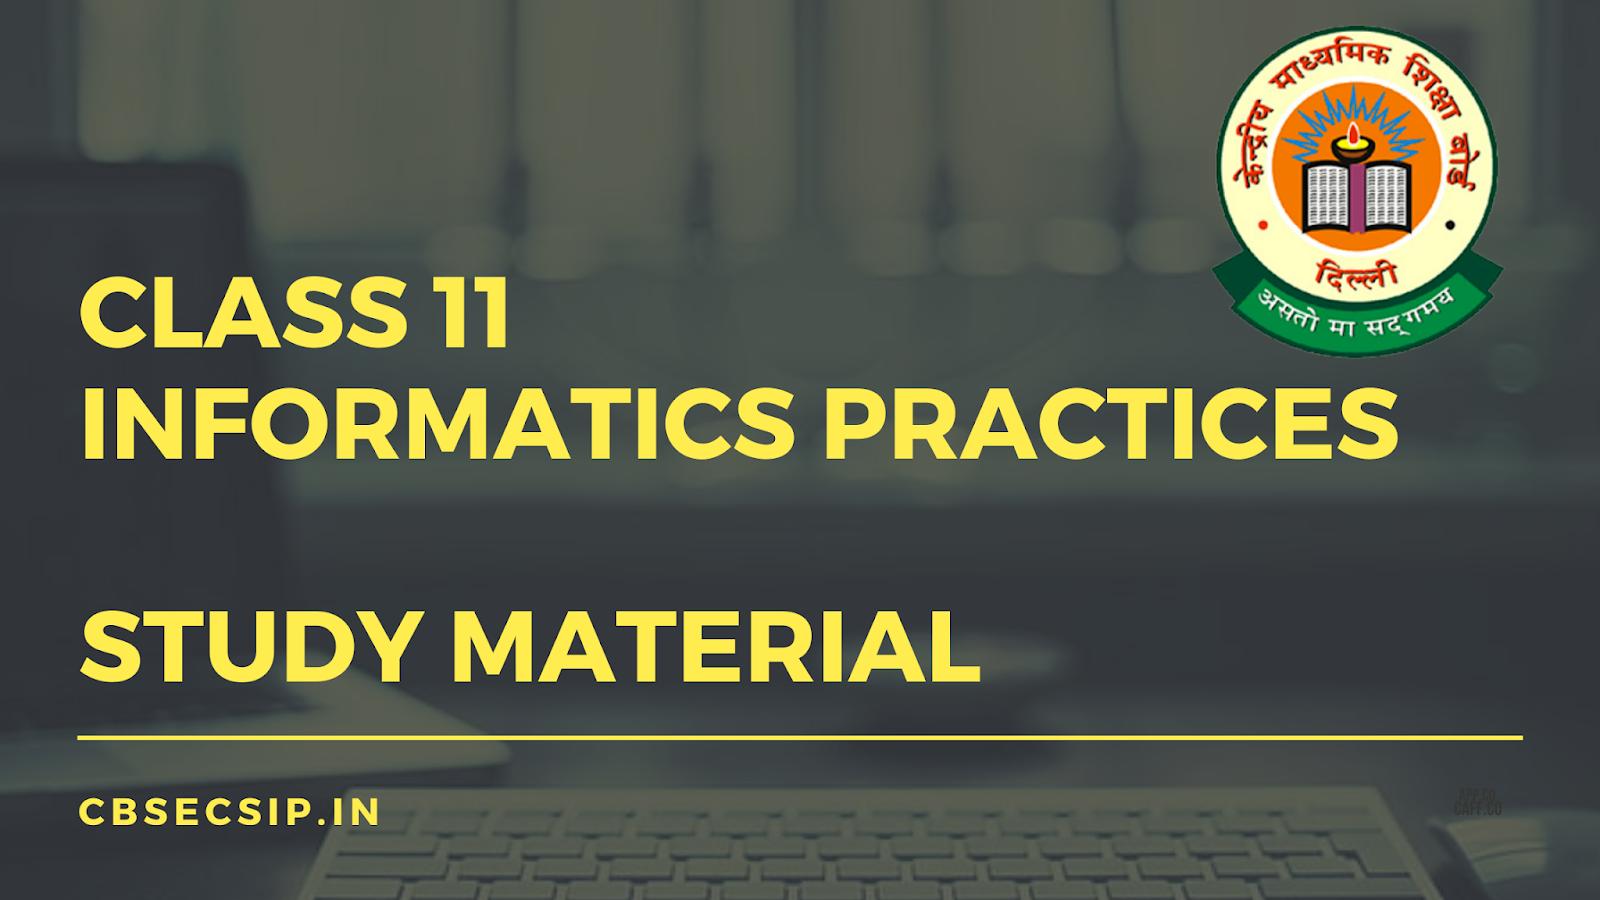 Class 11 Informatics Practices Study Material